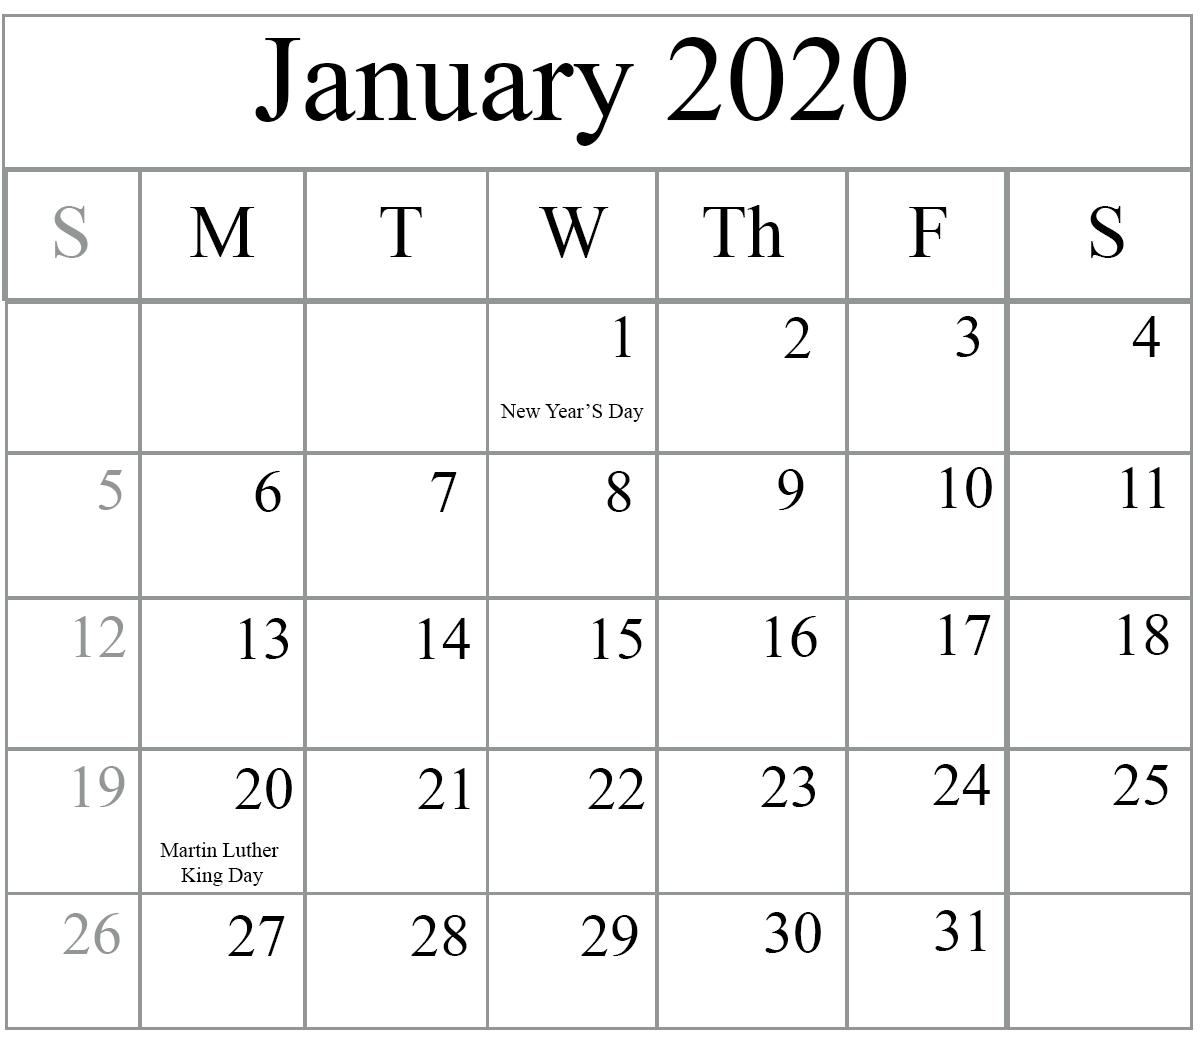 Blank January 2020 Calendar Printable In Pdf, Word, Excel-January 2020 Calendar In Excel